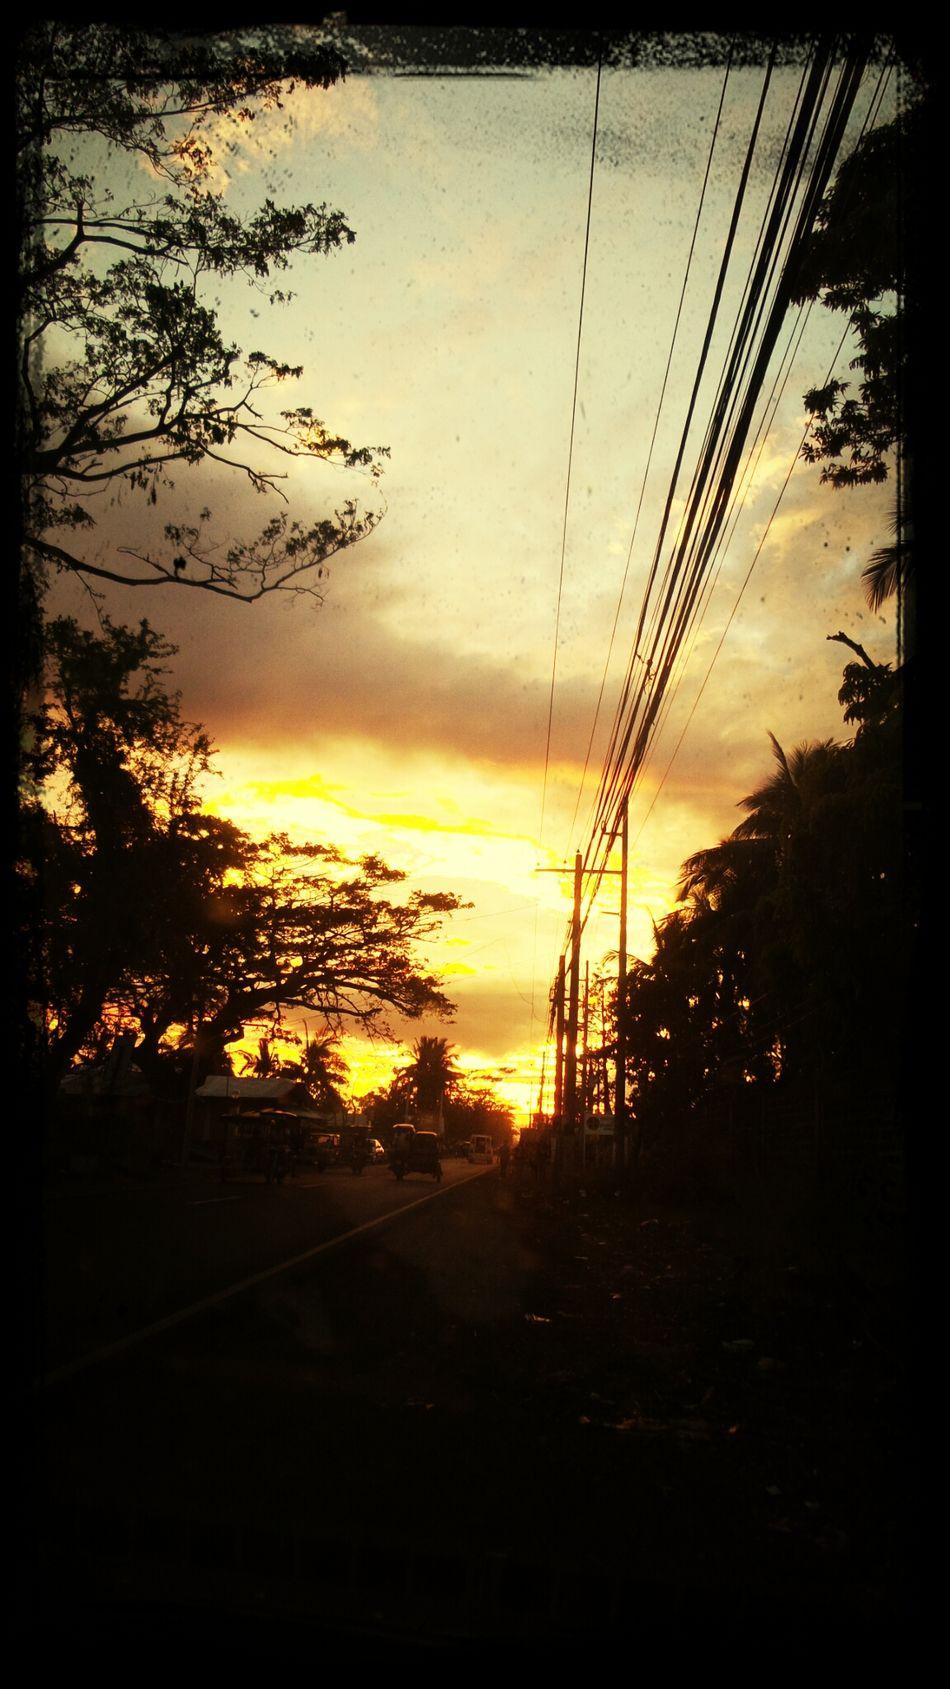 burning Sky On The Road Sunset